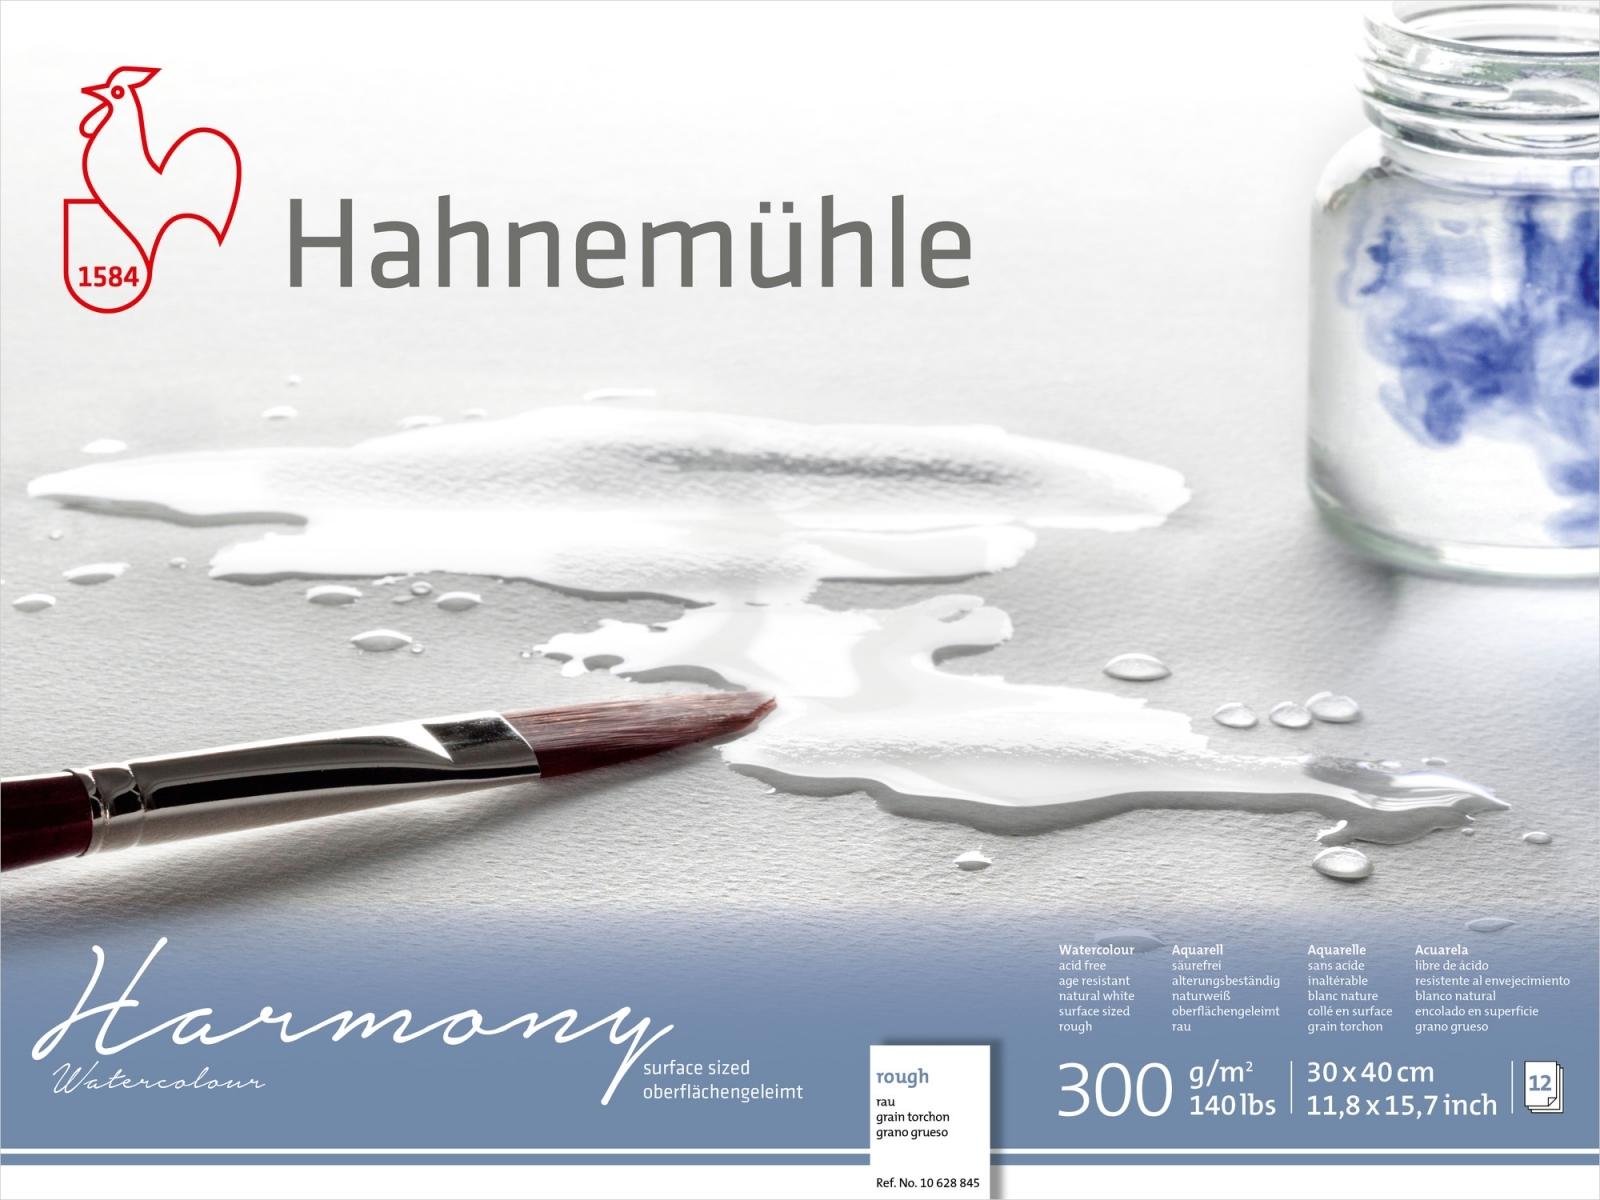 PAPEL HAHNEMUHLE HARMONY WATERCOLOUR, 300 G/M², ROUGH 12fls 30x40 (10628845)  - Papelaria Botafogo